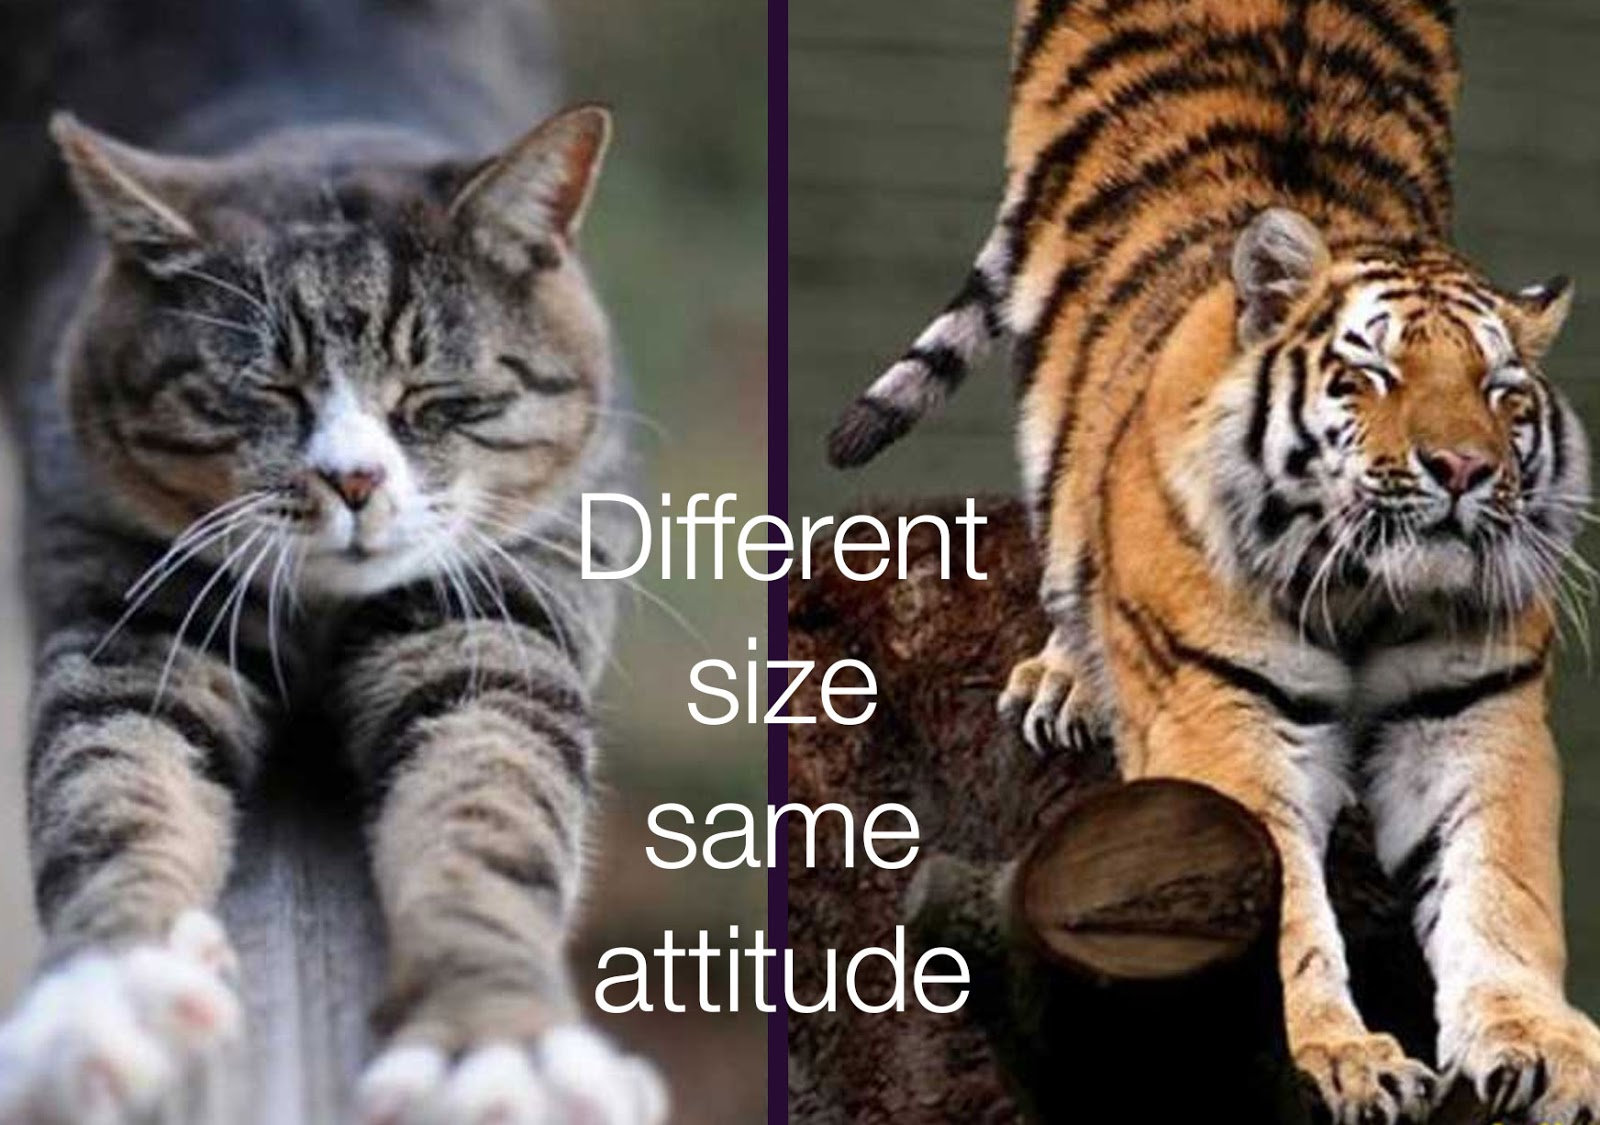 Shiny Madhu: Cat and Tiger